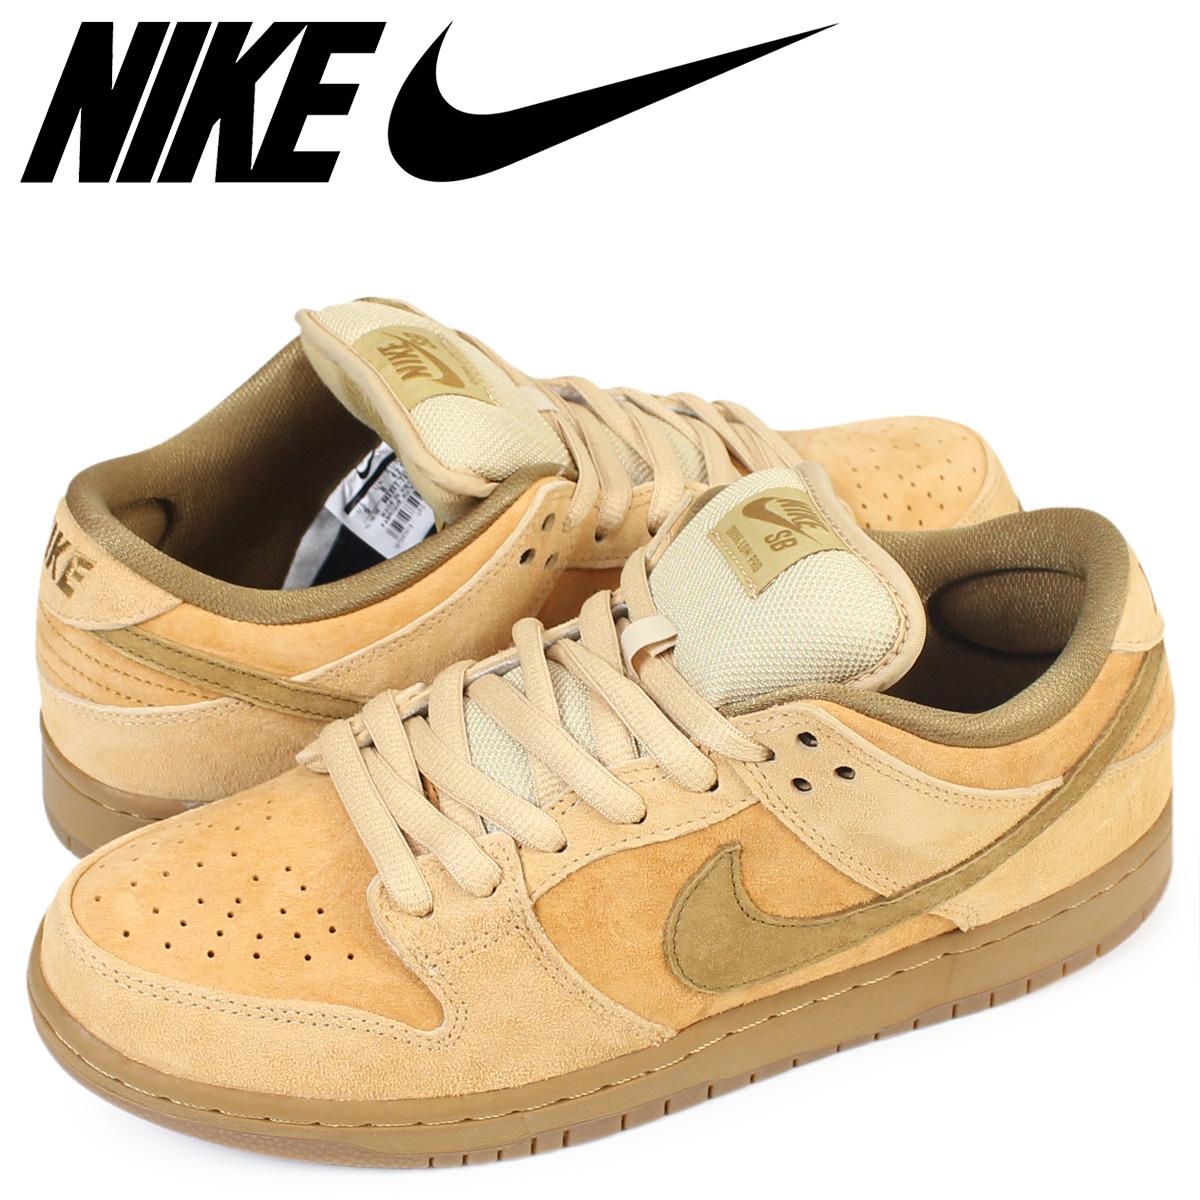 best loved e704c 8e322 NIKE Nike SB dunk low sneakers DUNK LOW TRD QS 883,232-700 mens shoes brown  96 Shinnyu load 179